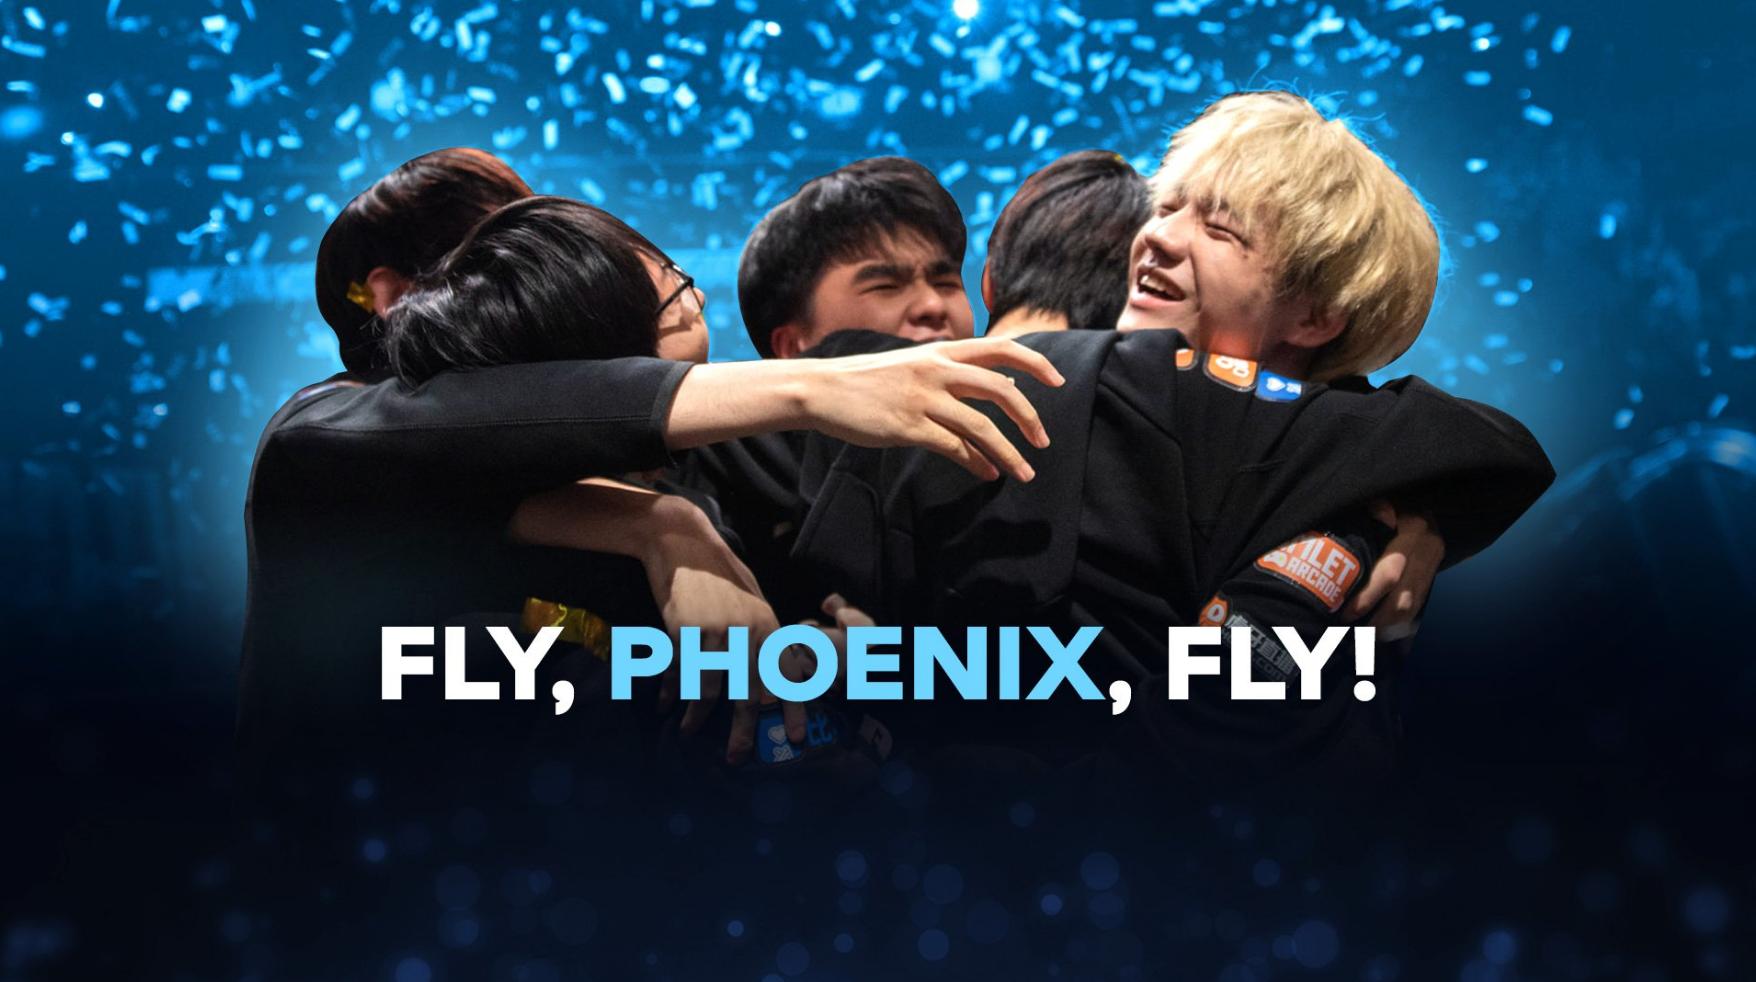 Fly, Phoenix, fly